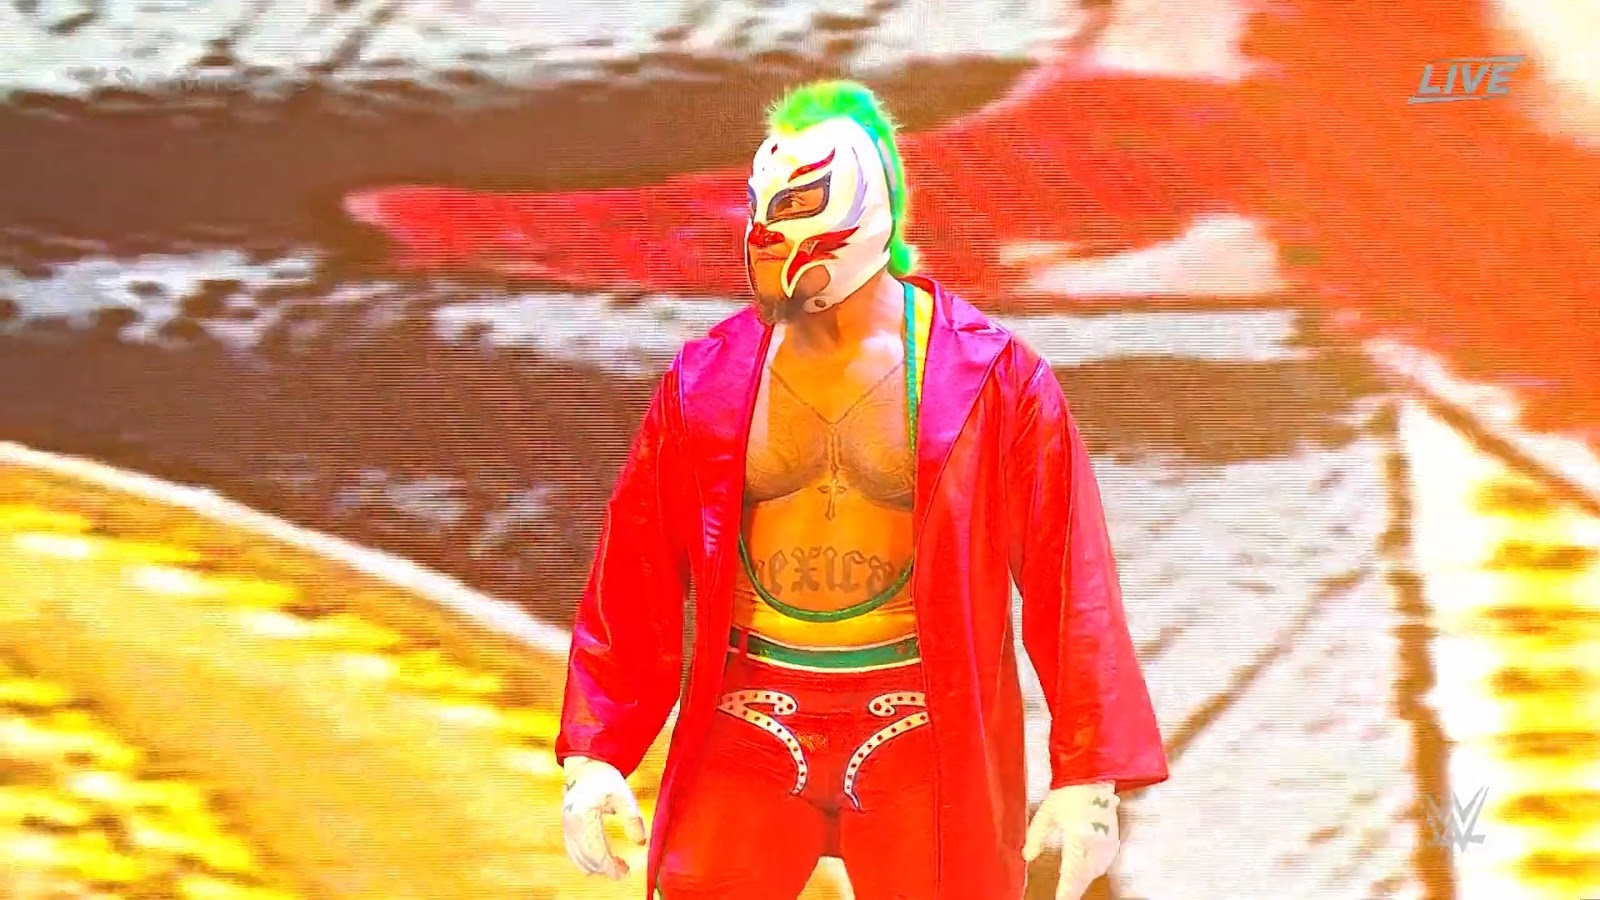 WWE+Survivor+Series+%282019%29+FULL+HD+1080p+Latino+-+Descargatepelis.com.mkv_snapshot_02.40.50.210.jpg (1600×900)